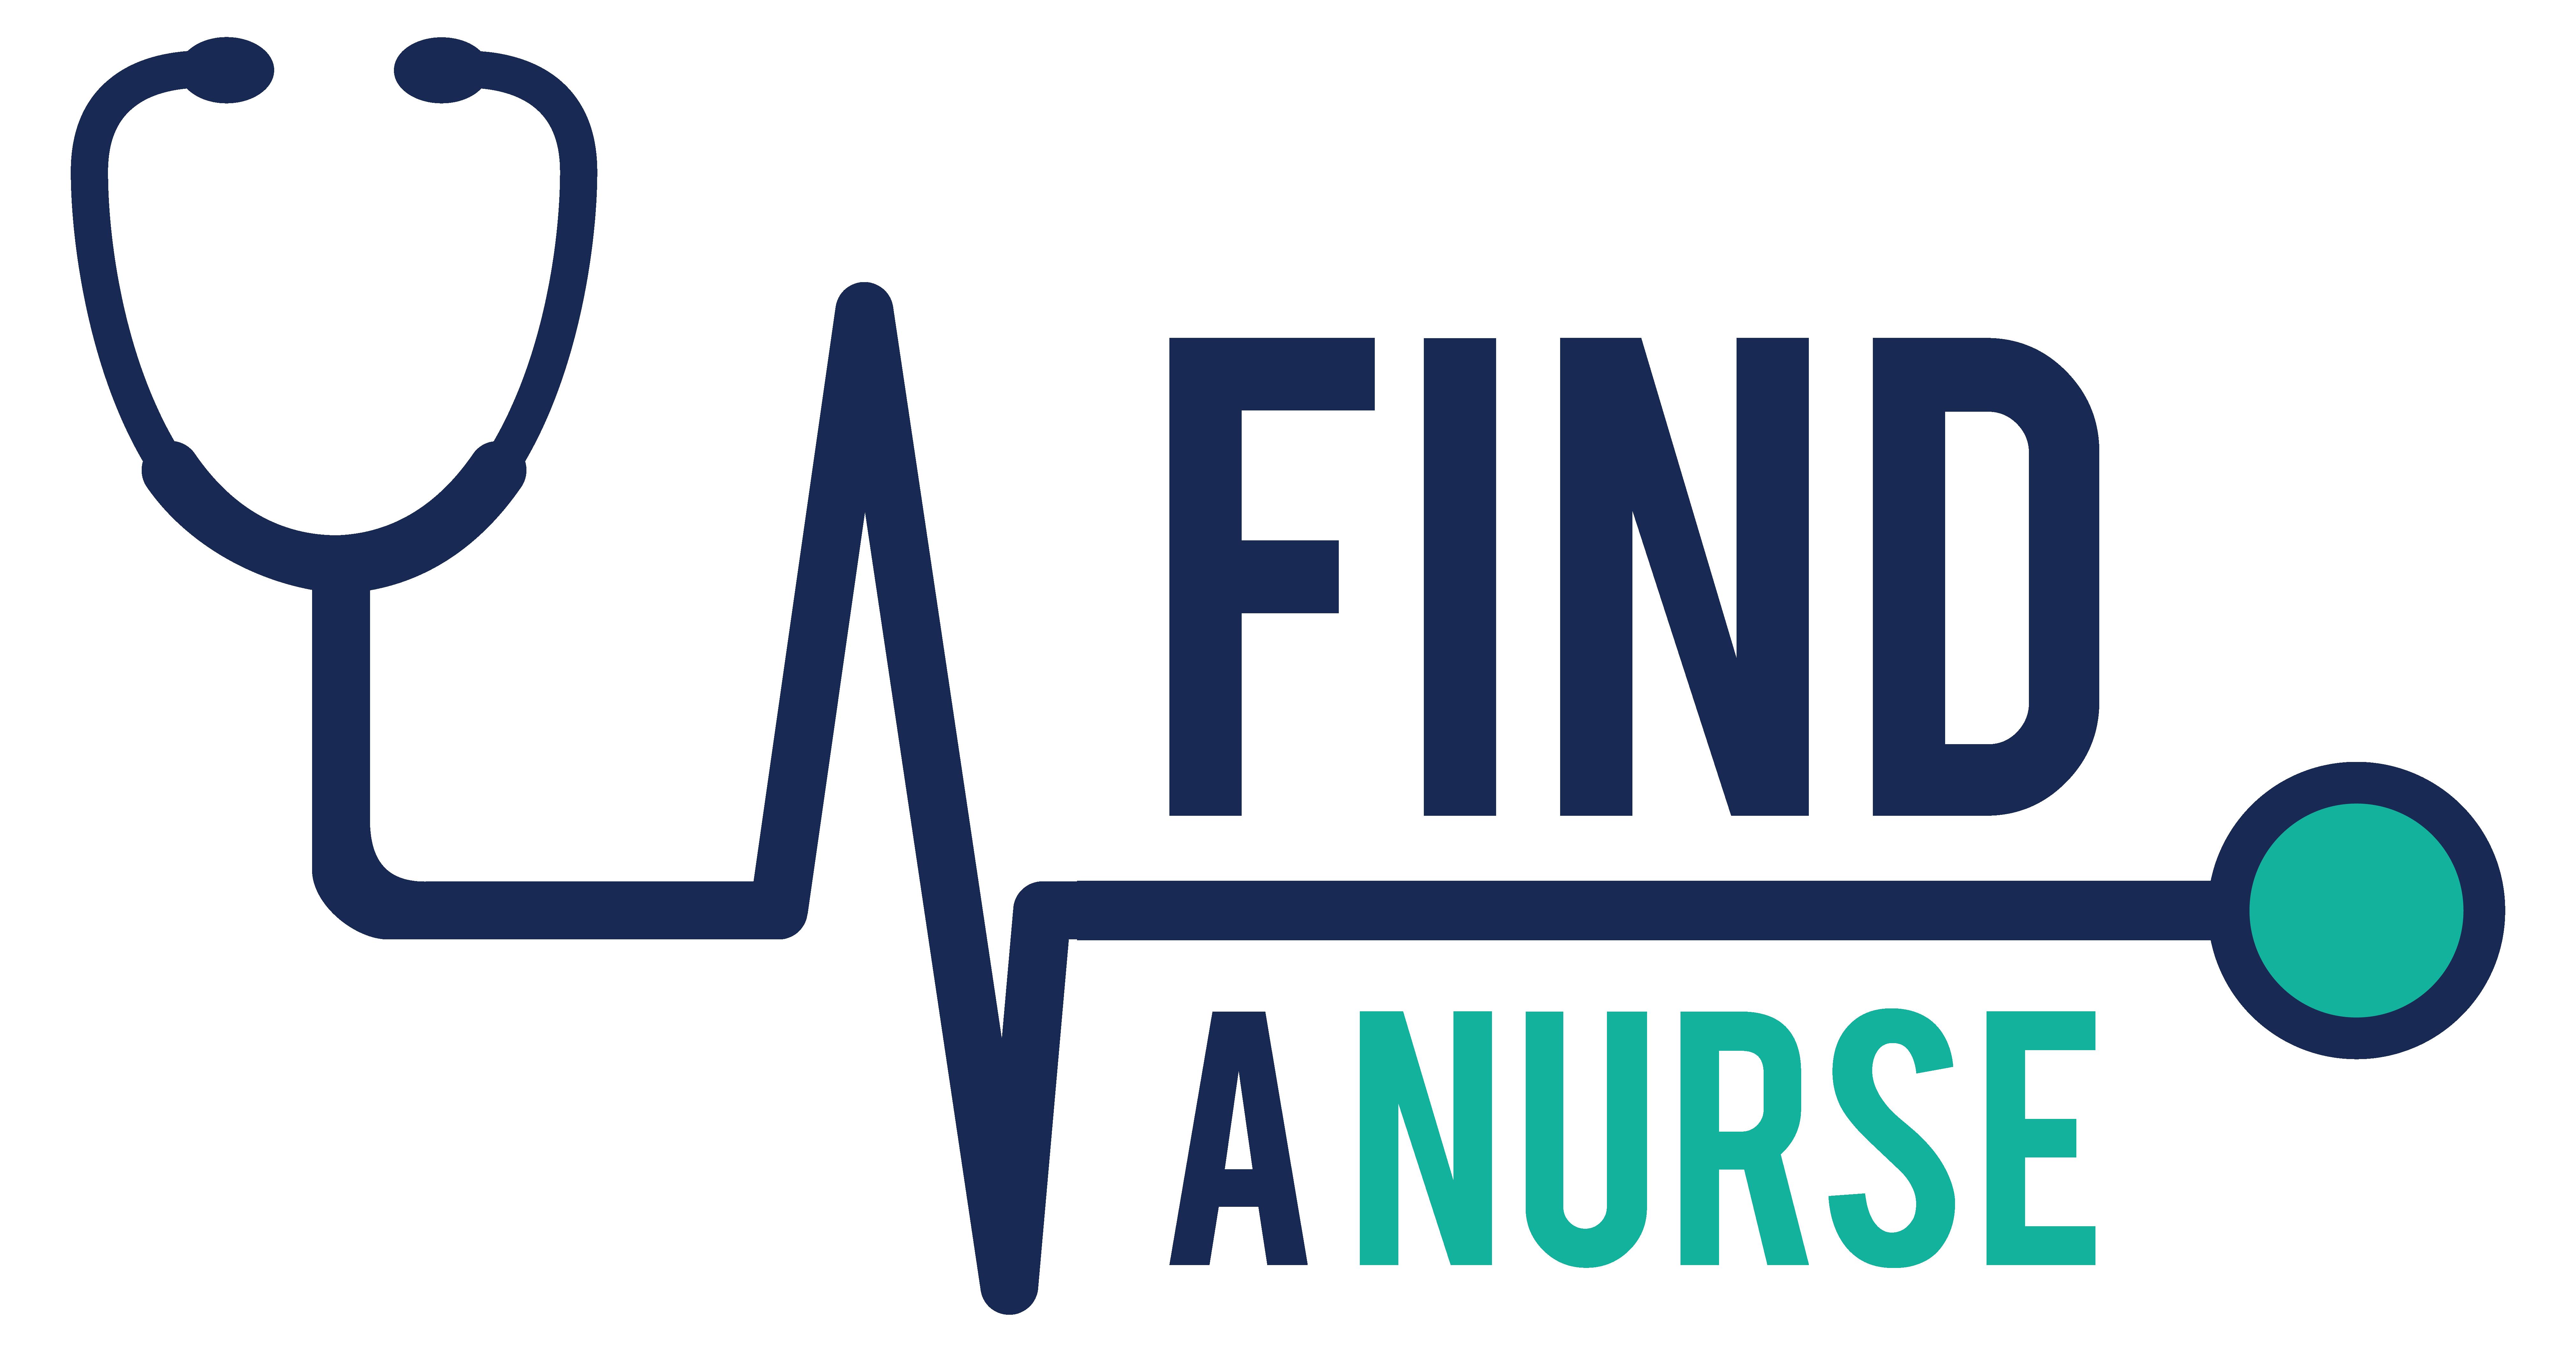 Find a gist network. Nurse clipart lab test